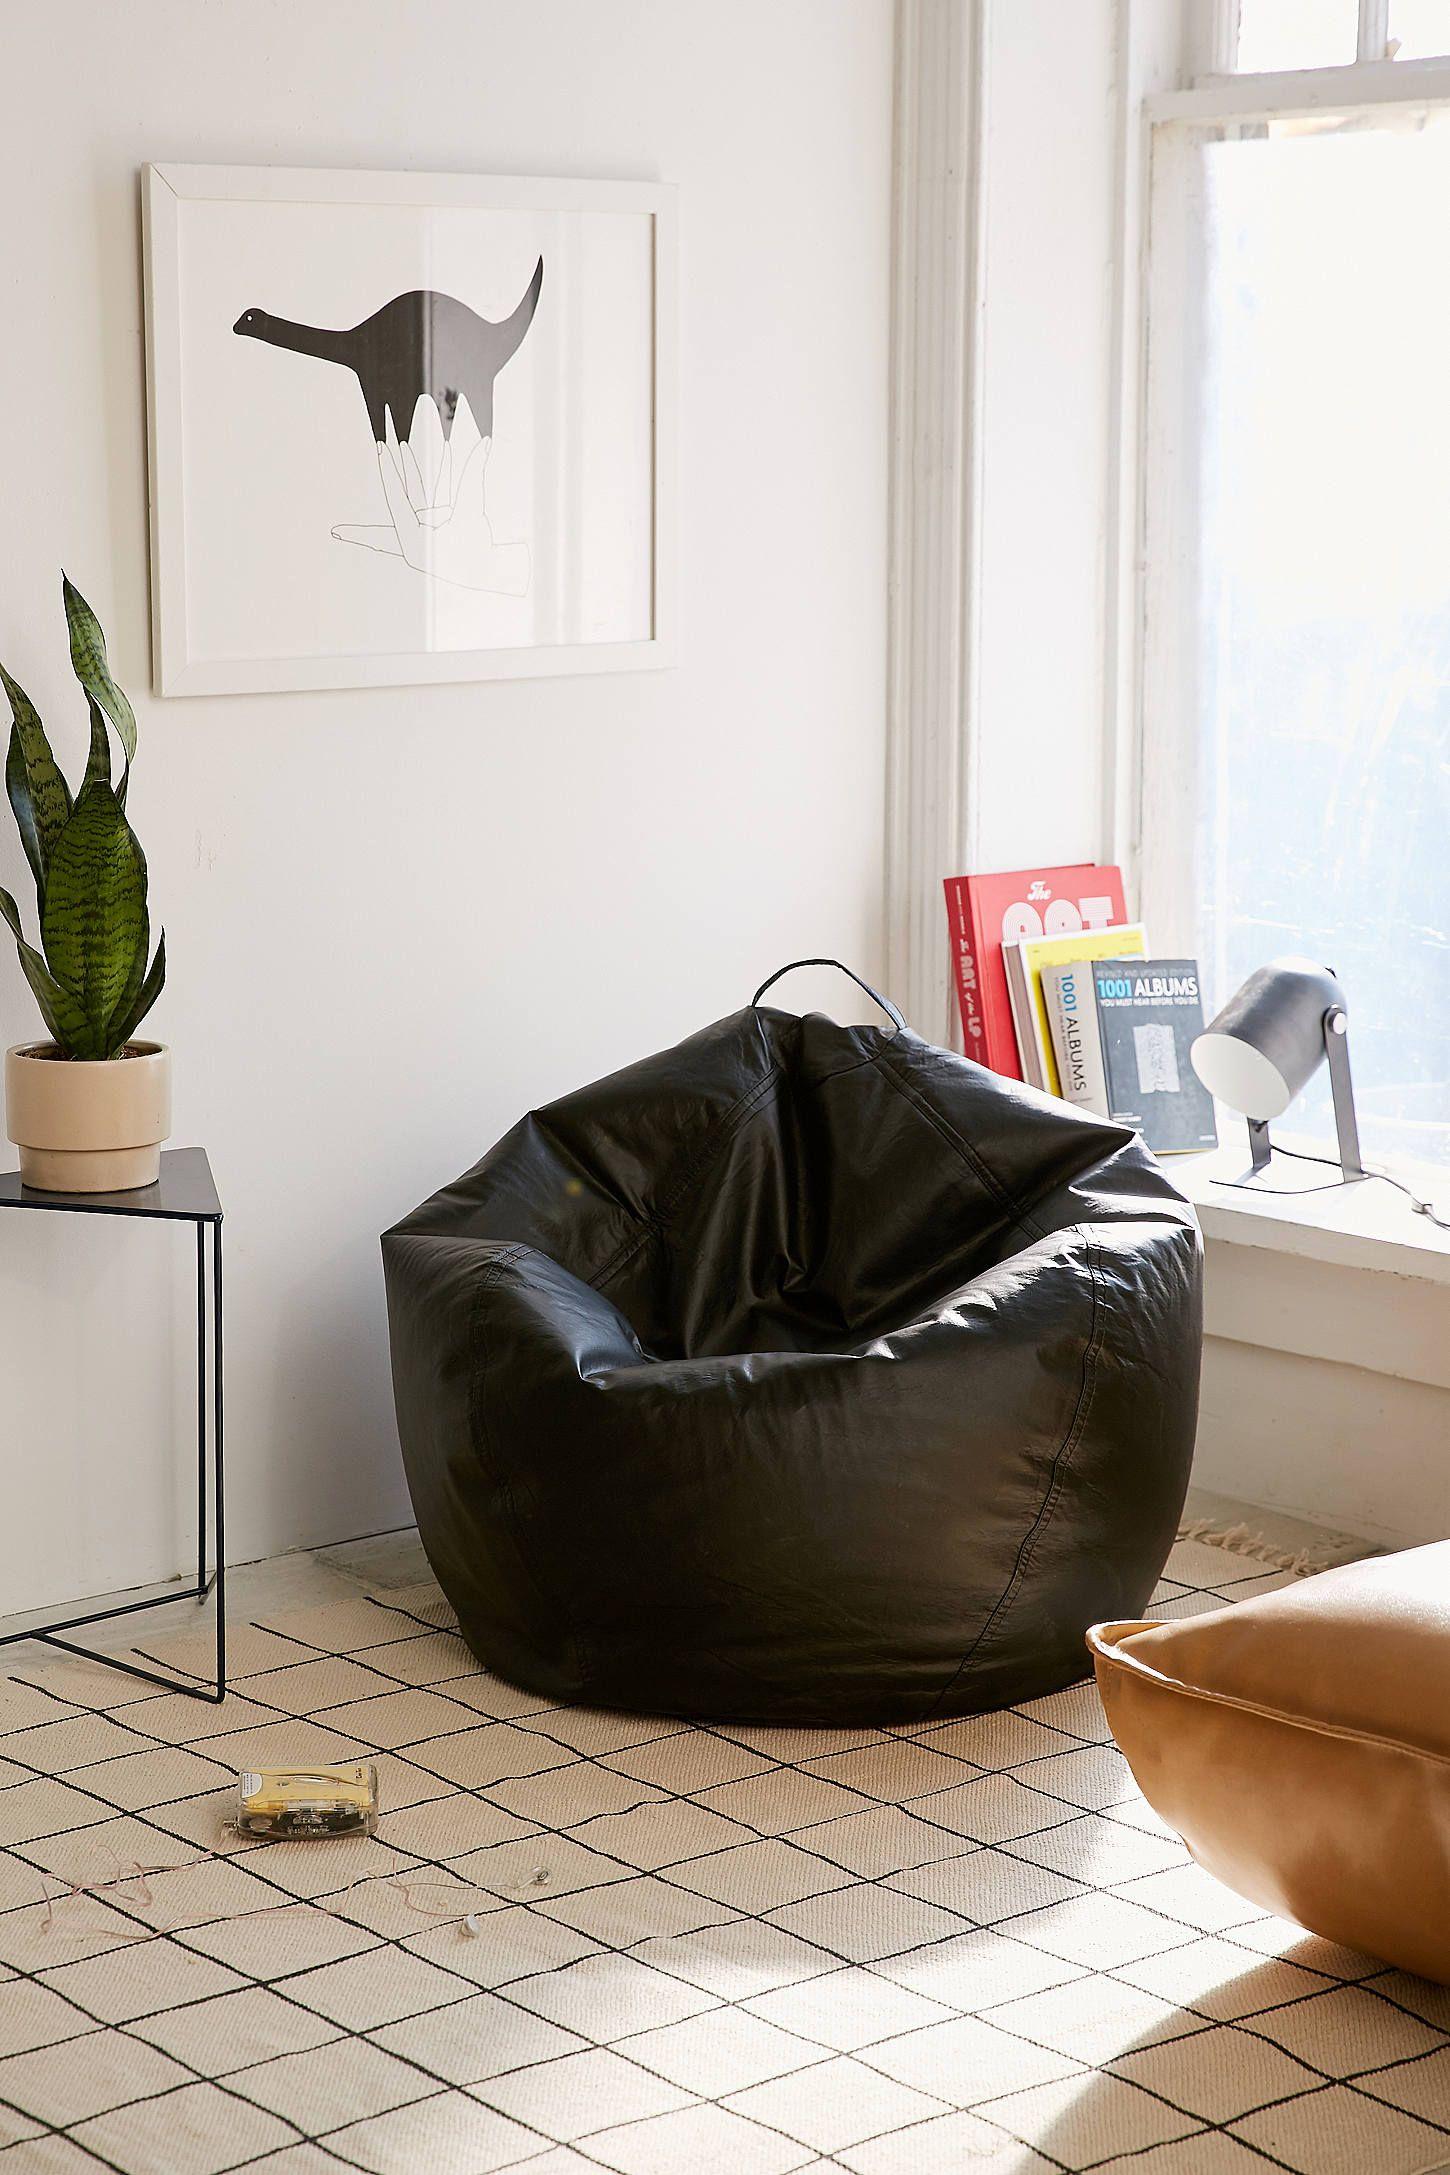 Wondrous Vinyl Bean Bag Home In 2019 Bean Bag Urban Outfitters Creativecarmelina Interior Chair Design Creativecarmelinacom